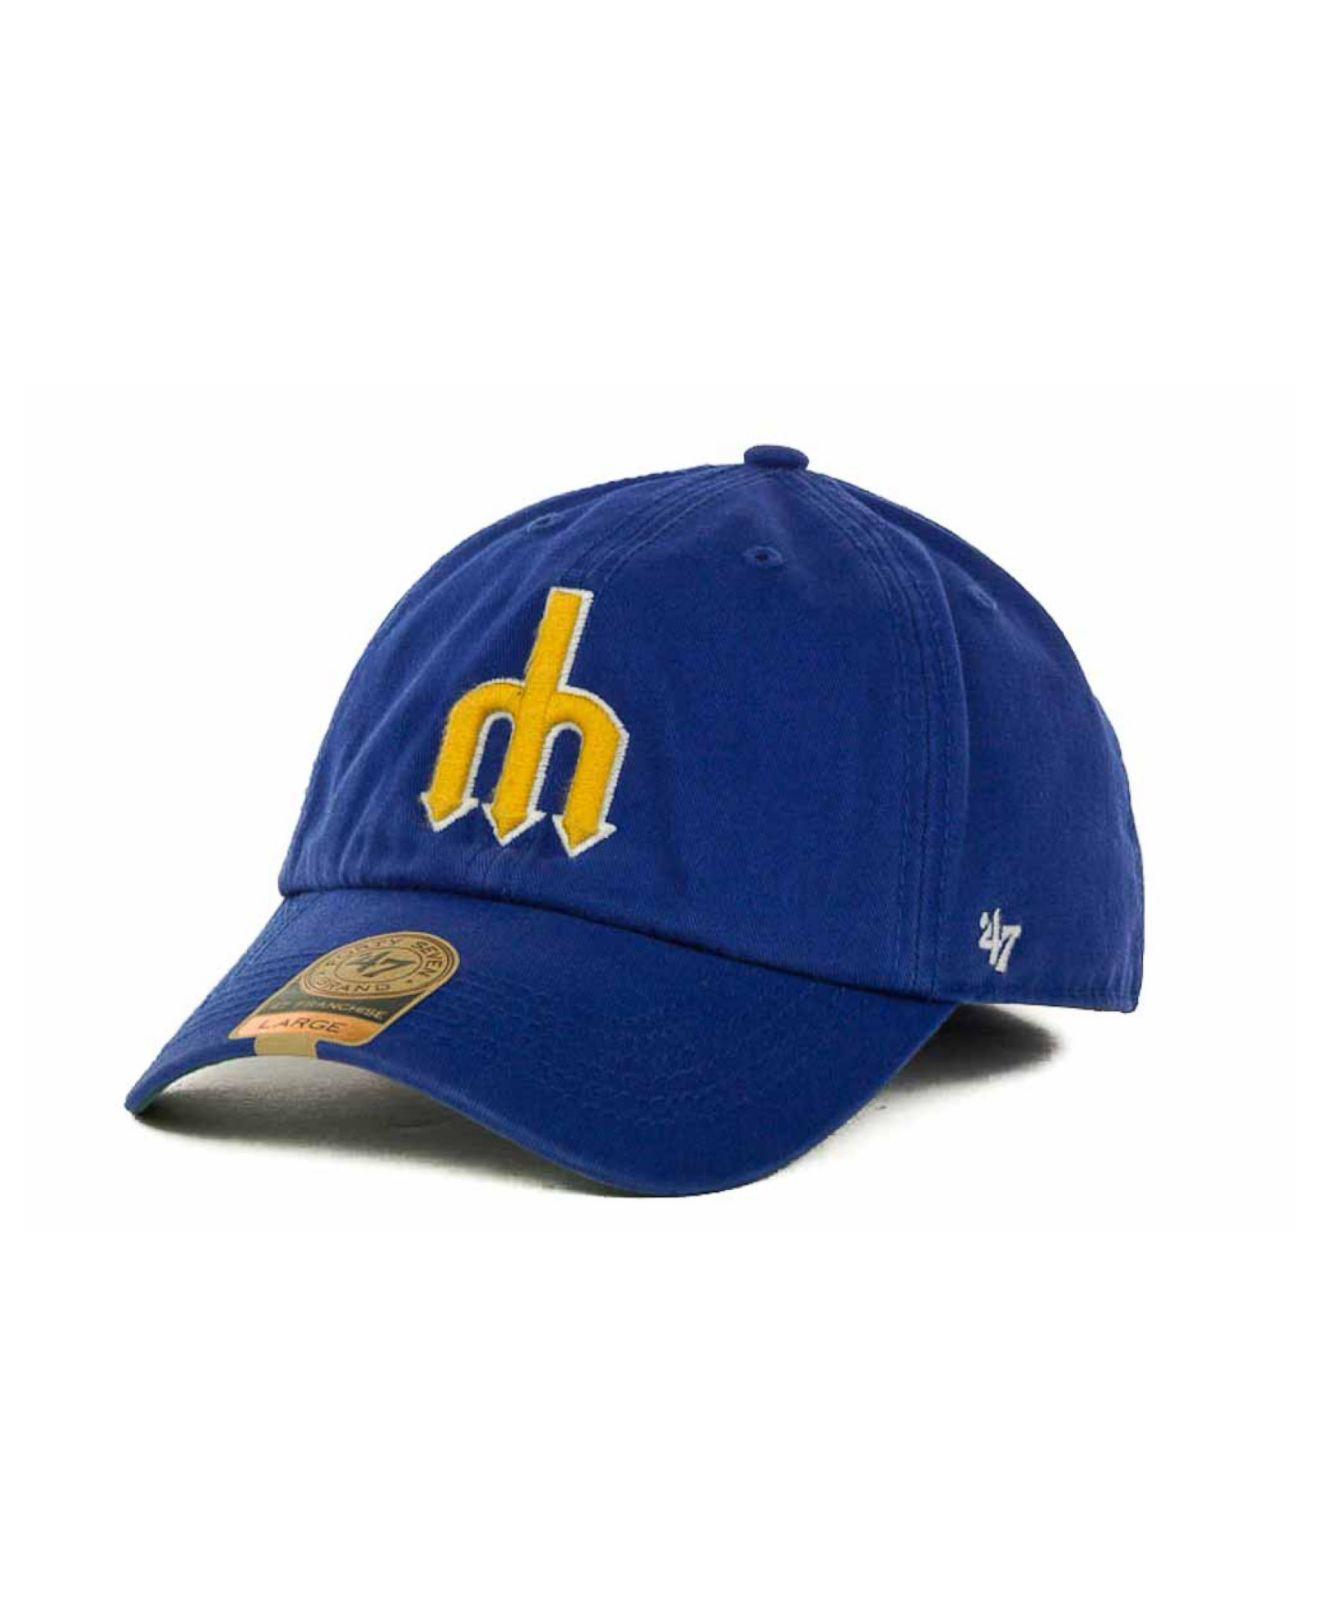 on sale 8bf3b 4c95f 47 Brand. Men s Green Seattle Mariners Mlb  47 Franchise Cap